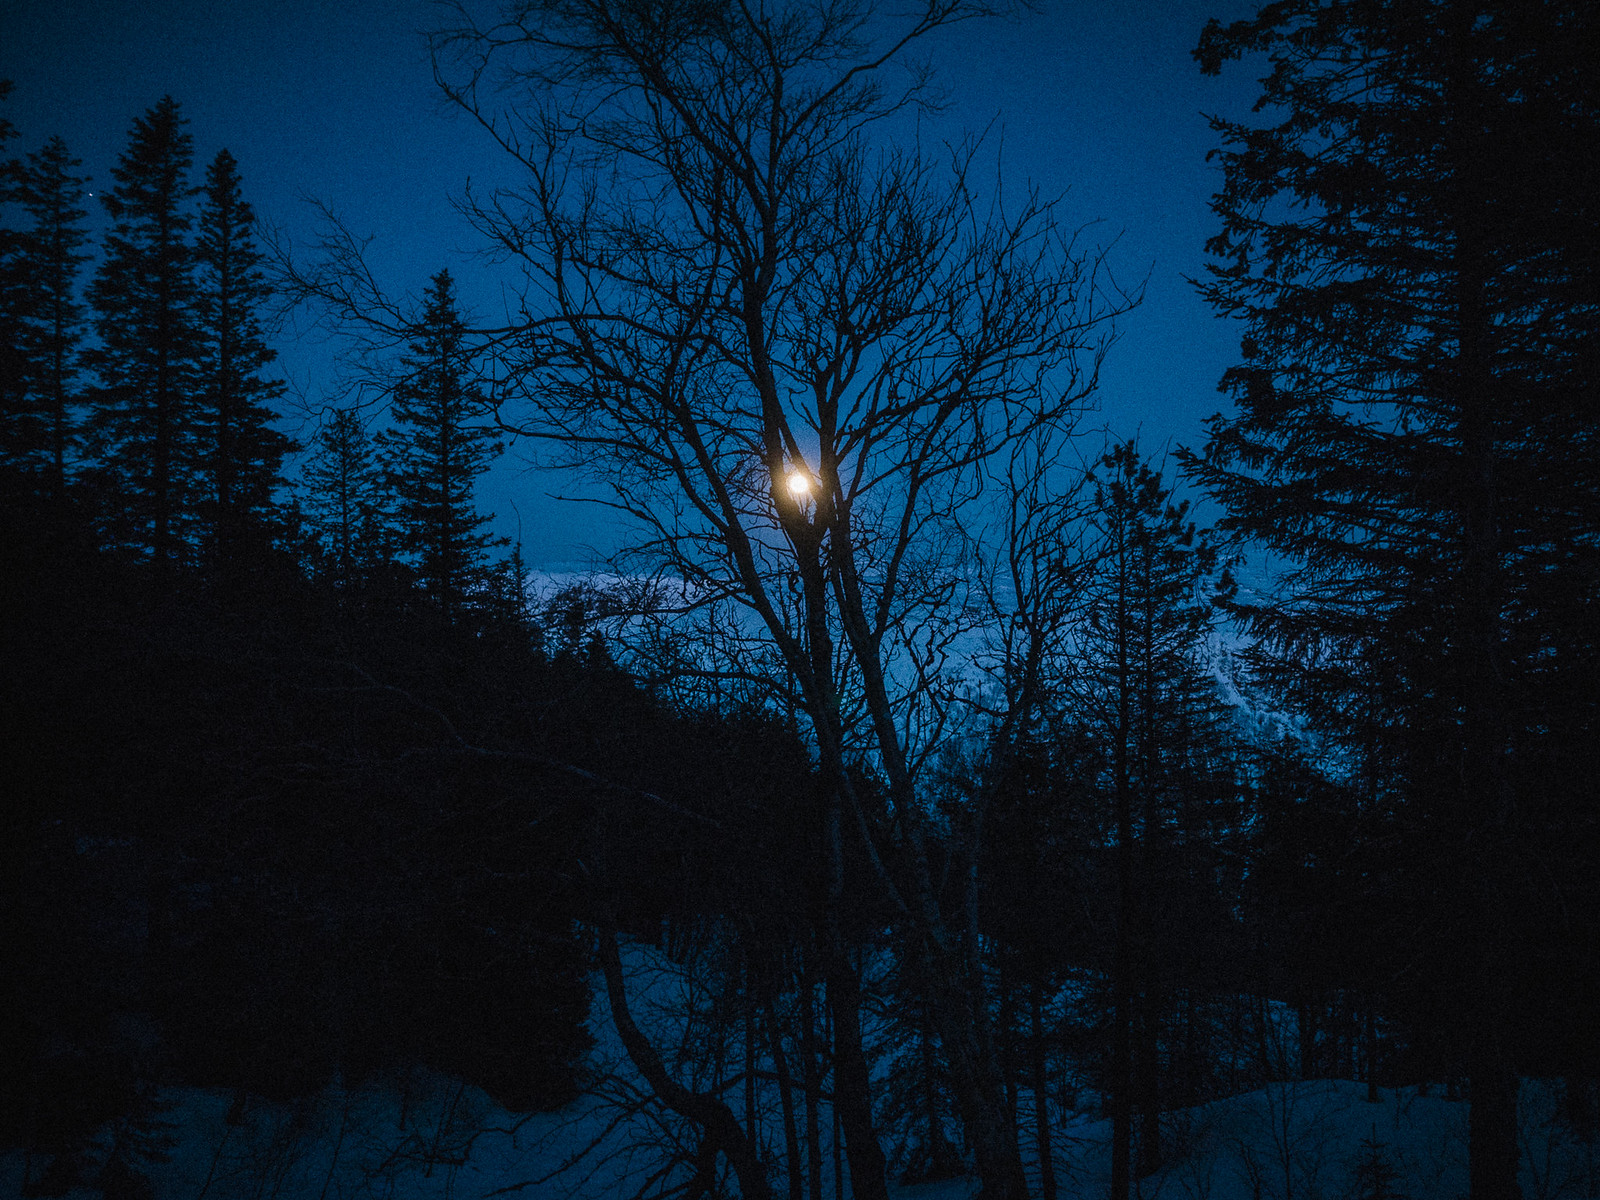 Moon at dusk behind leaveless tree. Winter.